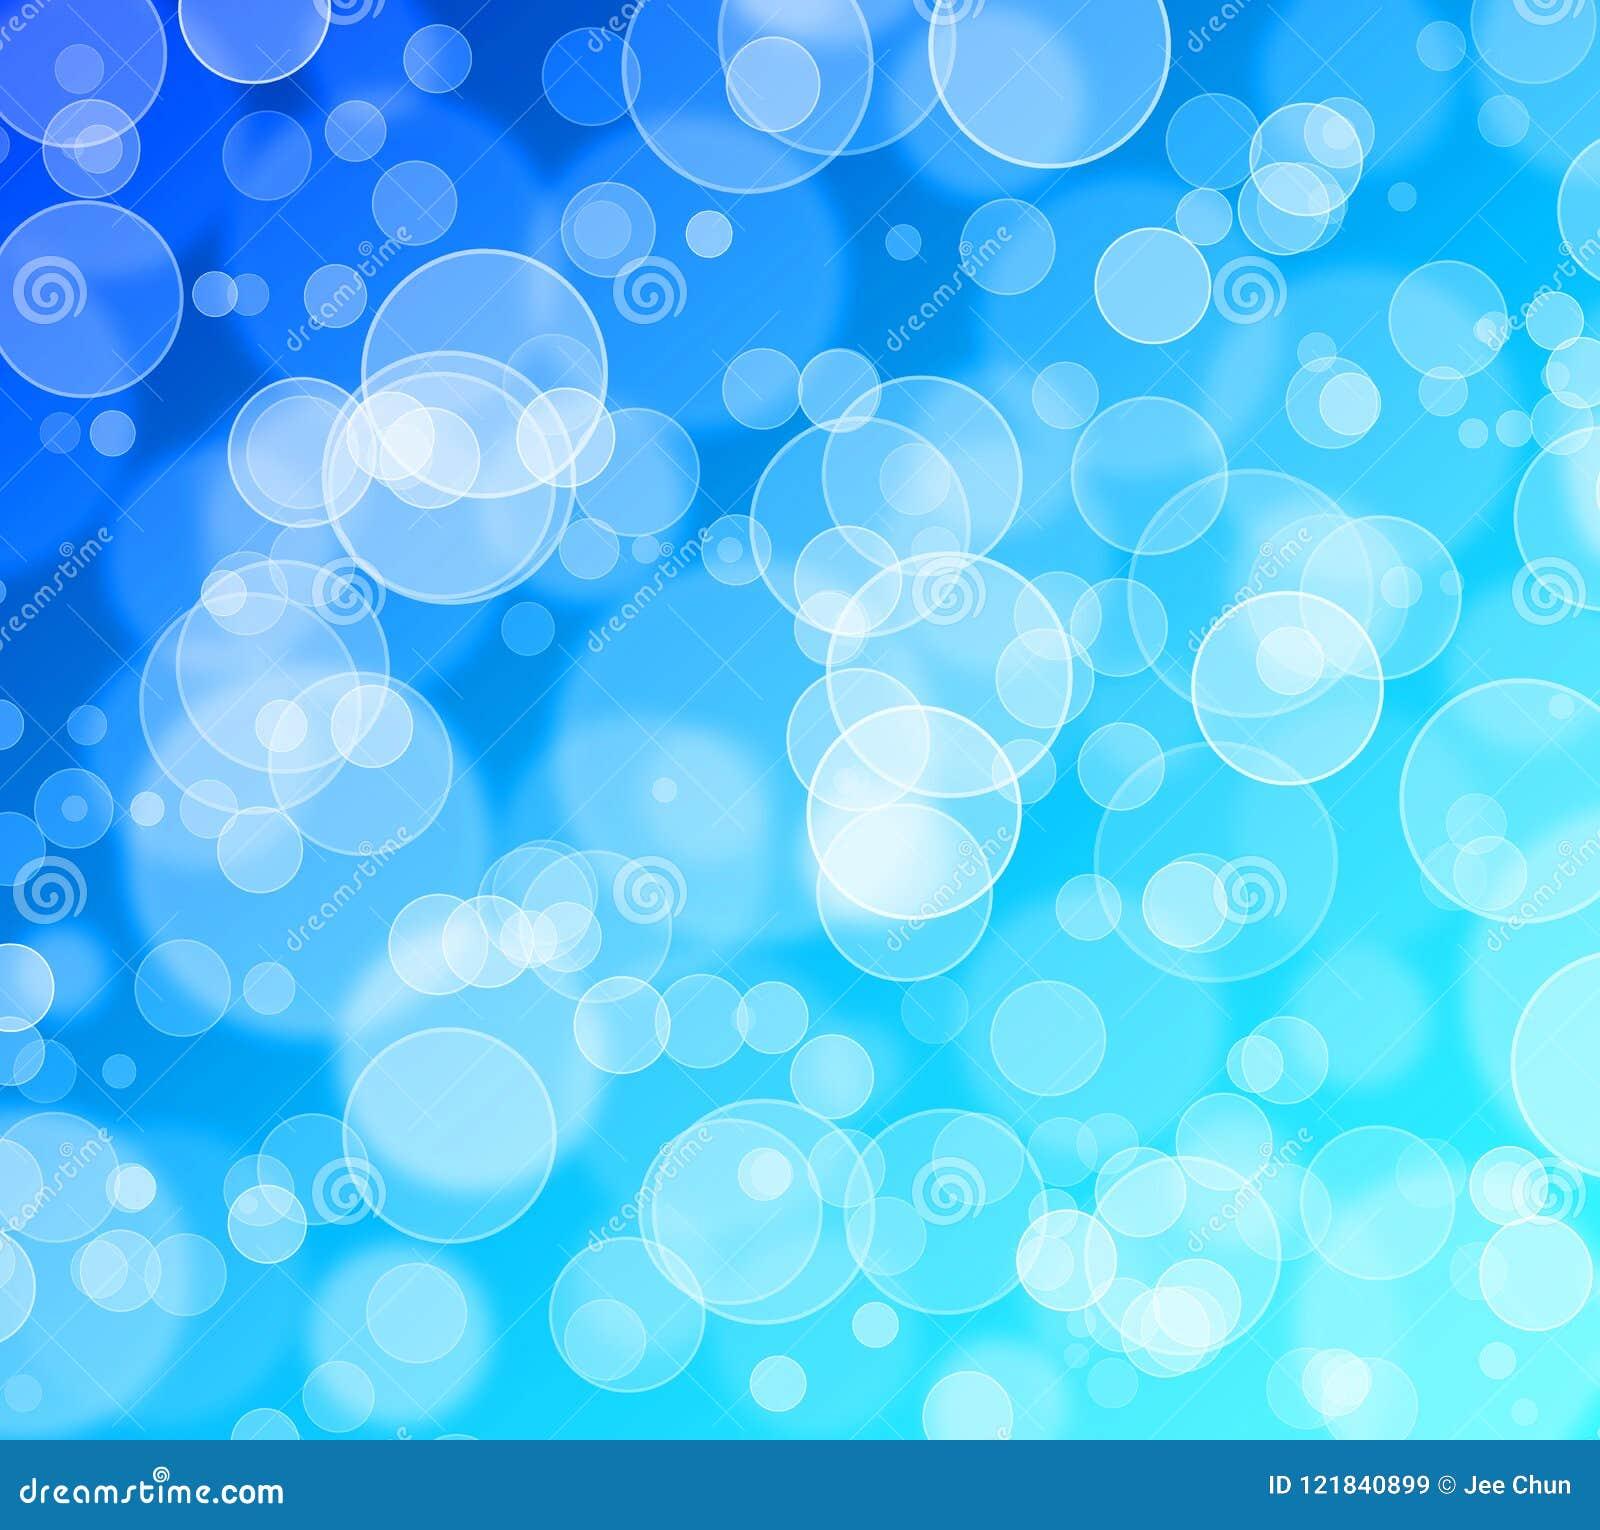 Abstract bokeh glitter background,blue,cyan.Festival,fantacy,celebration.Enjoy and happiness.